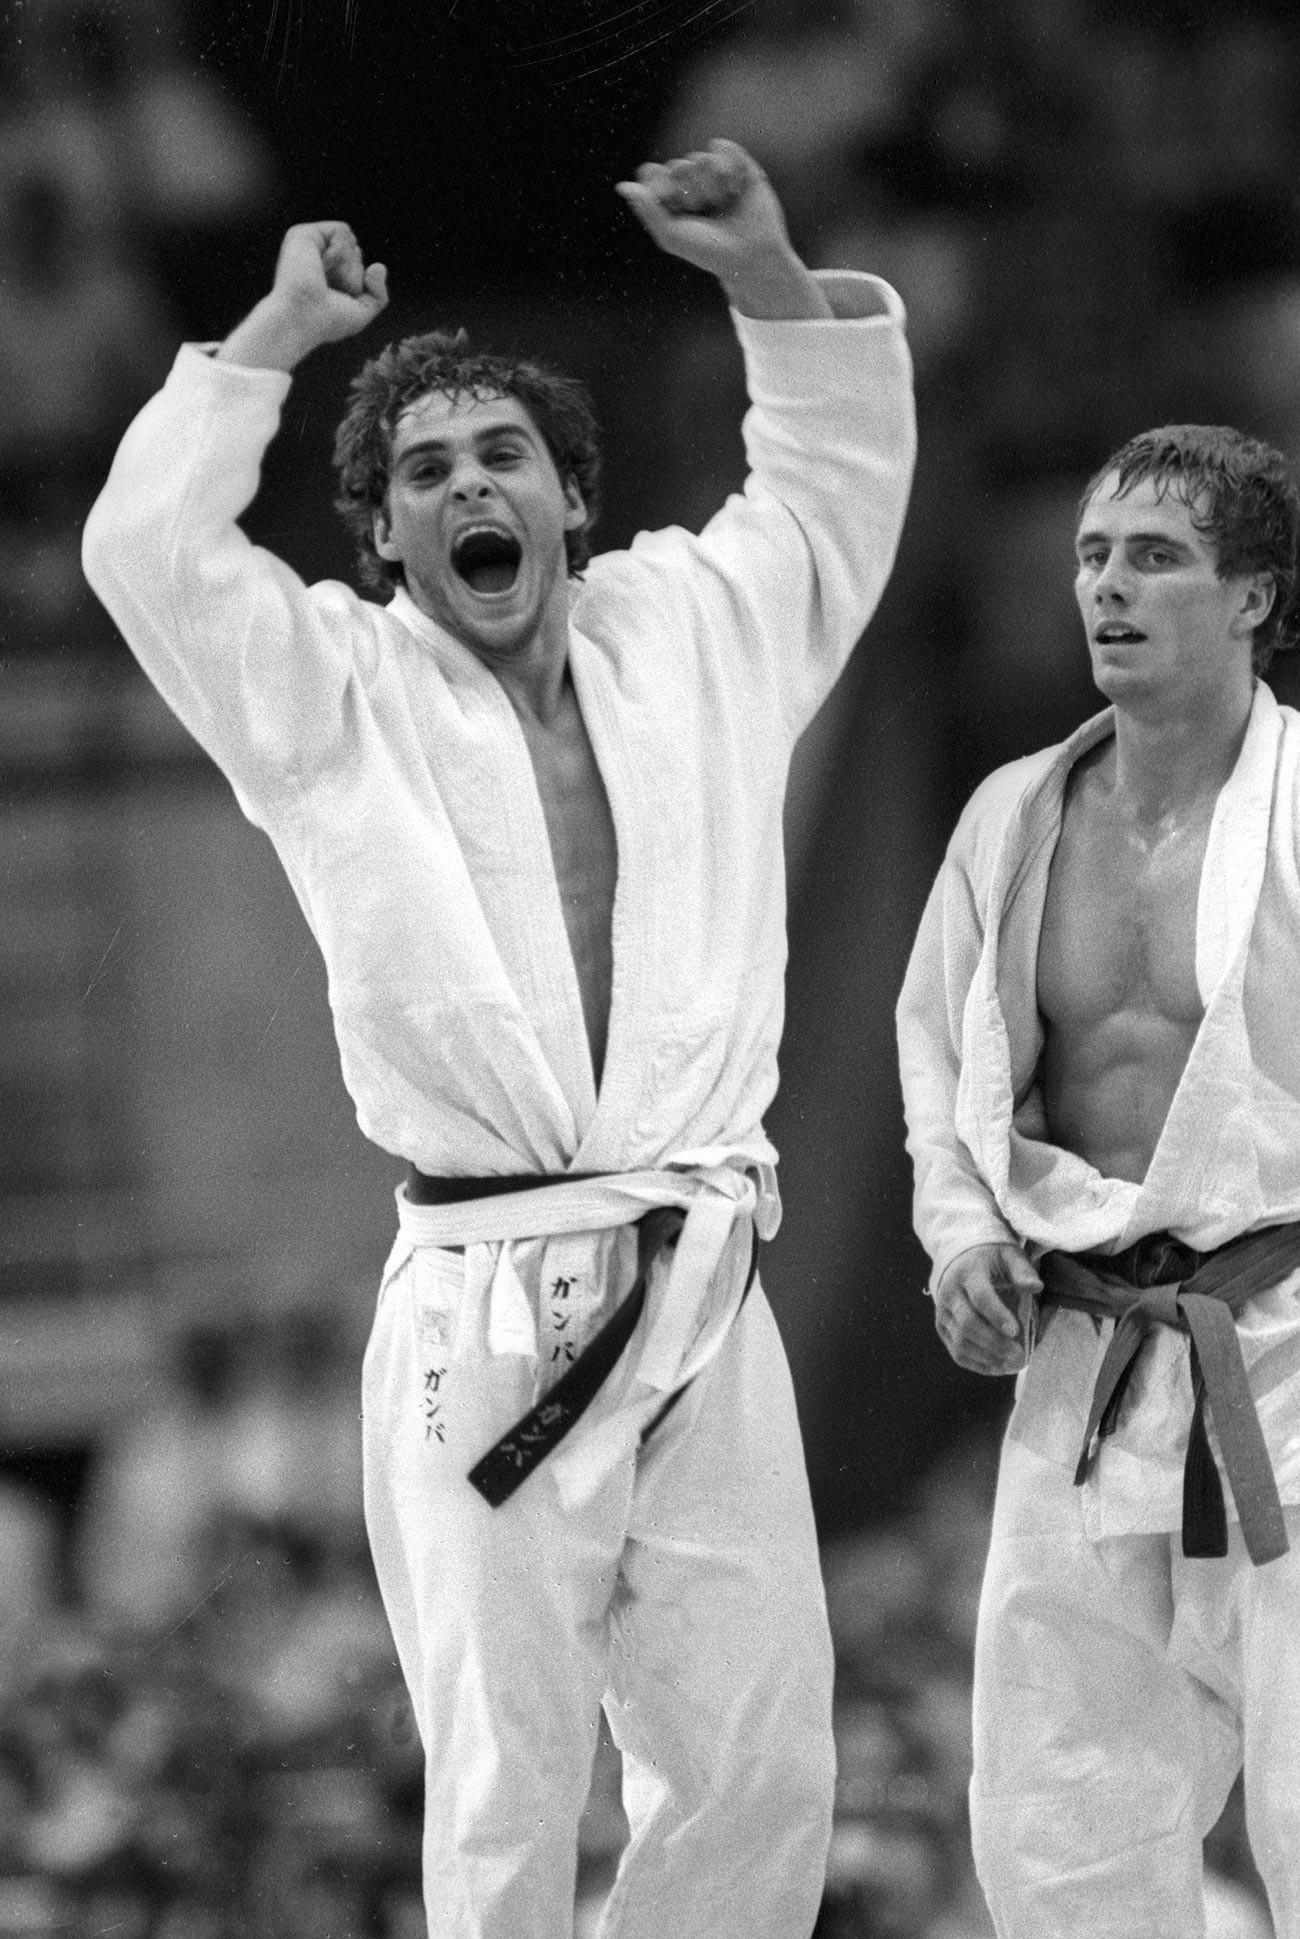 Italiener Ezio Gamba, Judo-Olympiasieger (links)